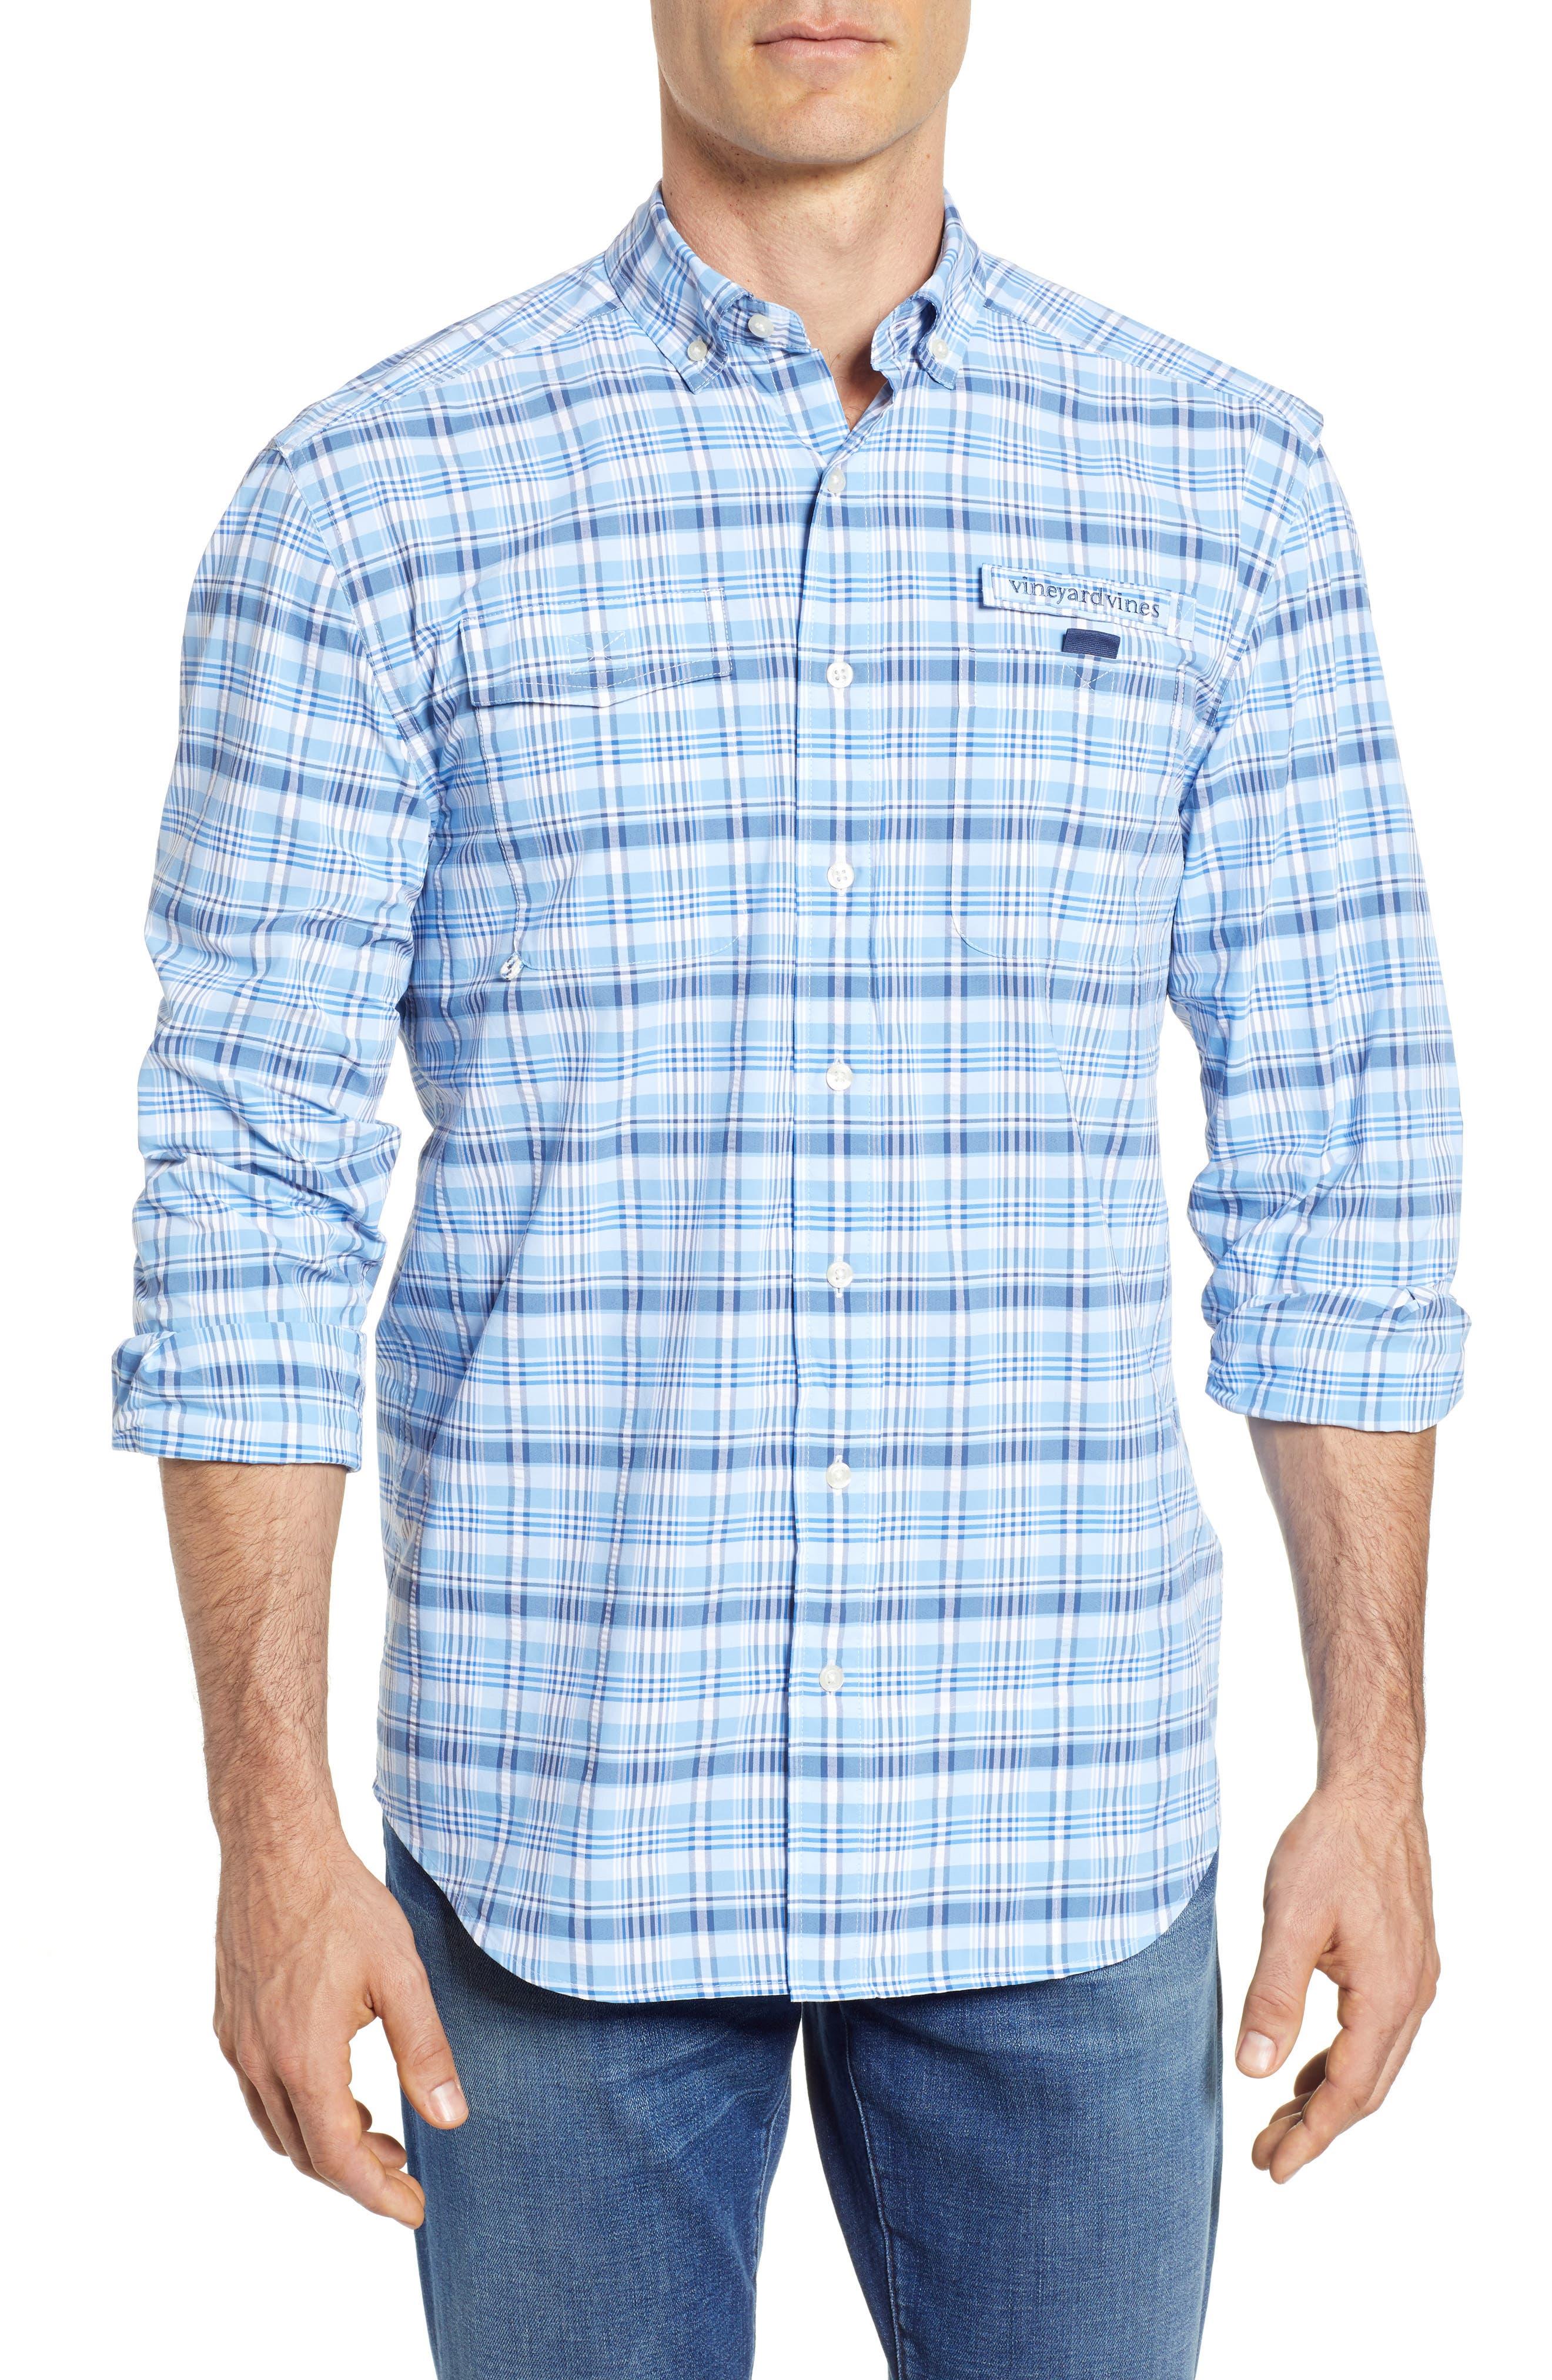 Prospect Hill Harbor Regular Fit Plaid Performance Sport Shirt,                         Main,                         color, Ocean Breeze